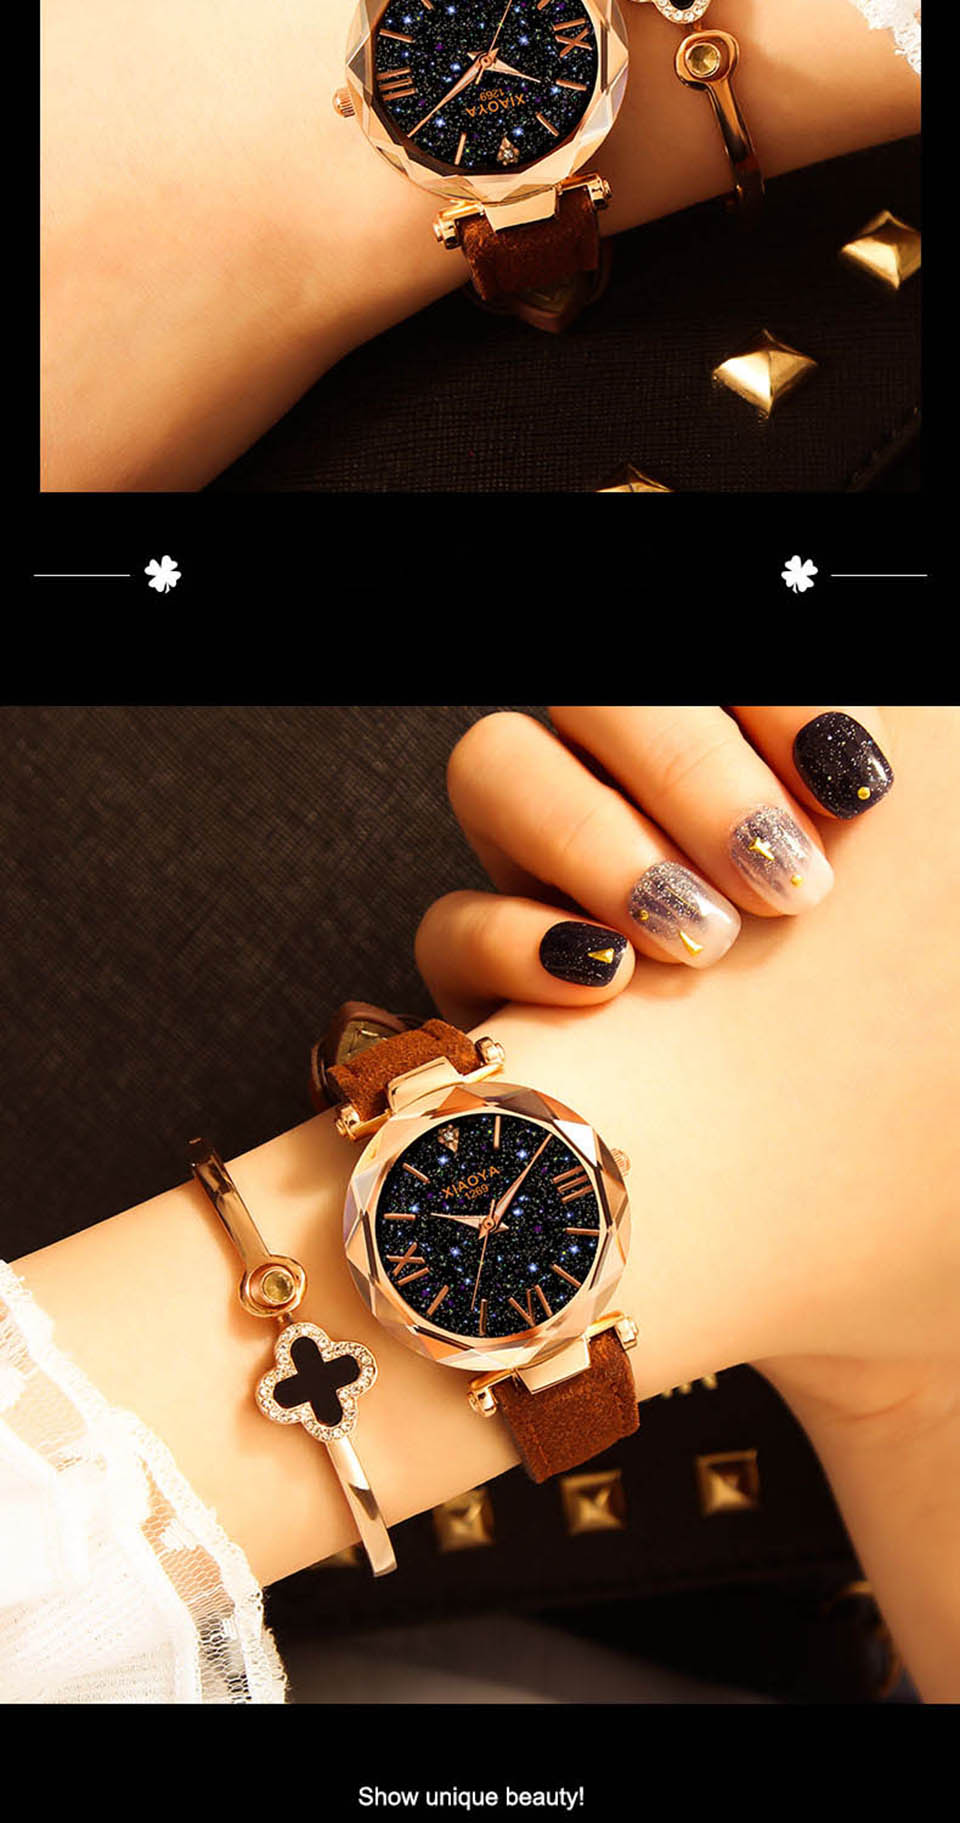 2018 Starry Sky Watch Women Minimalist Top Brand Luxury Wrist Watch For Ladies Female Clock Damski Montre Femme (6)